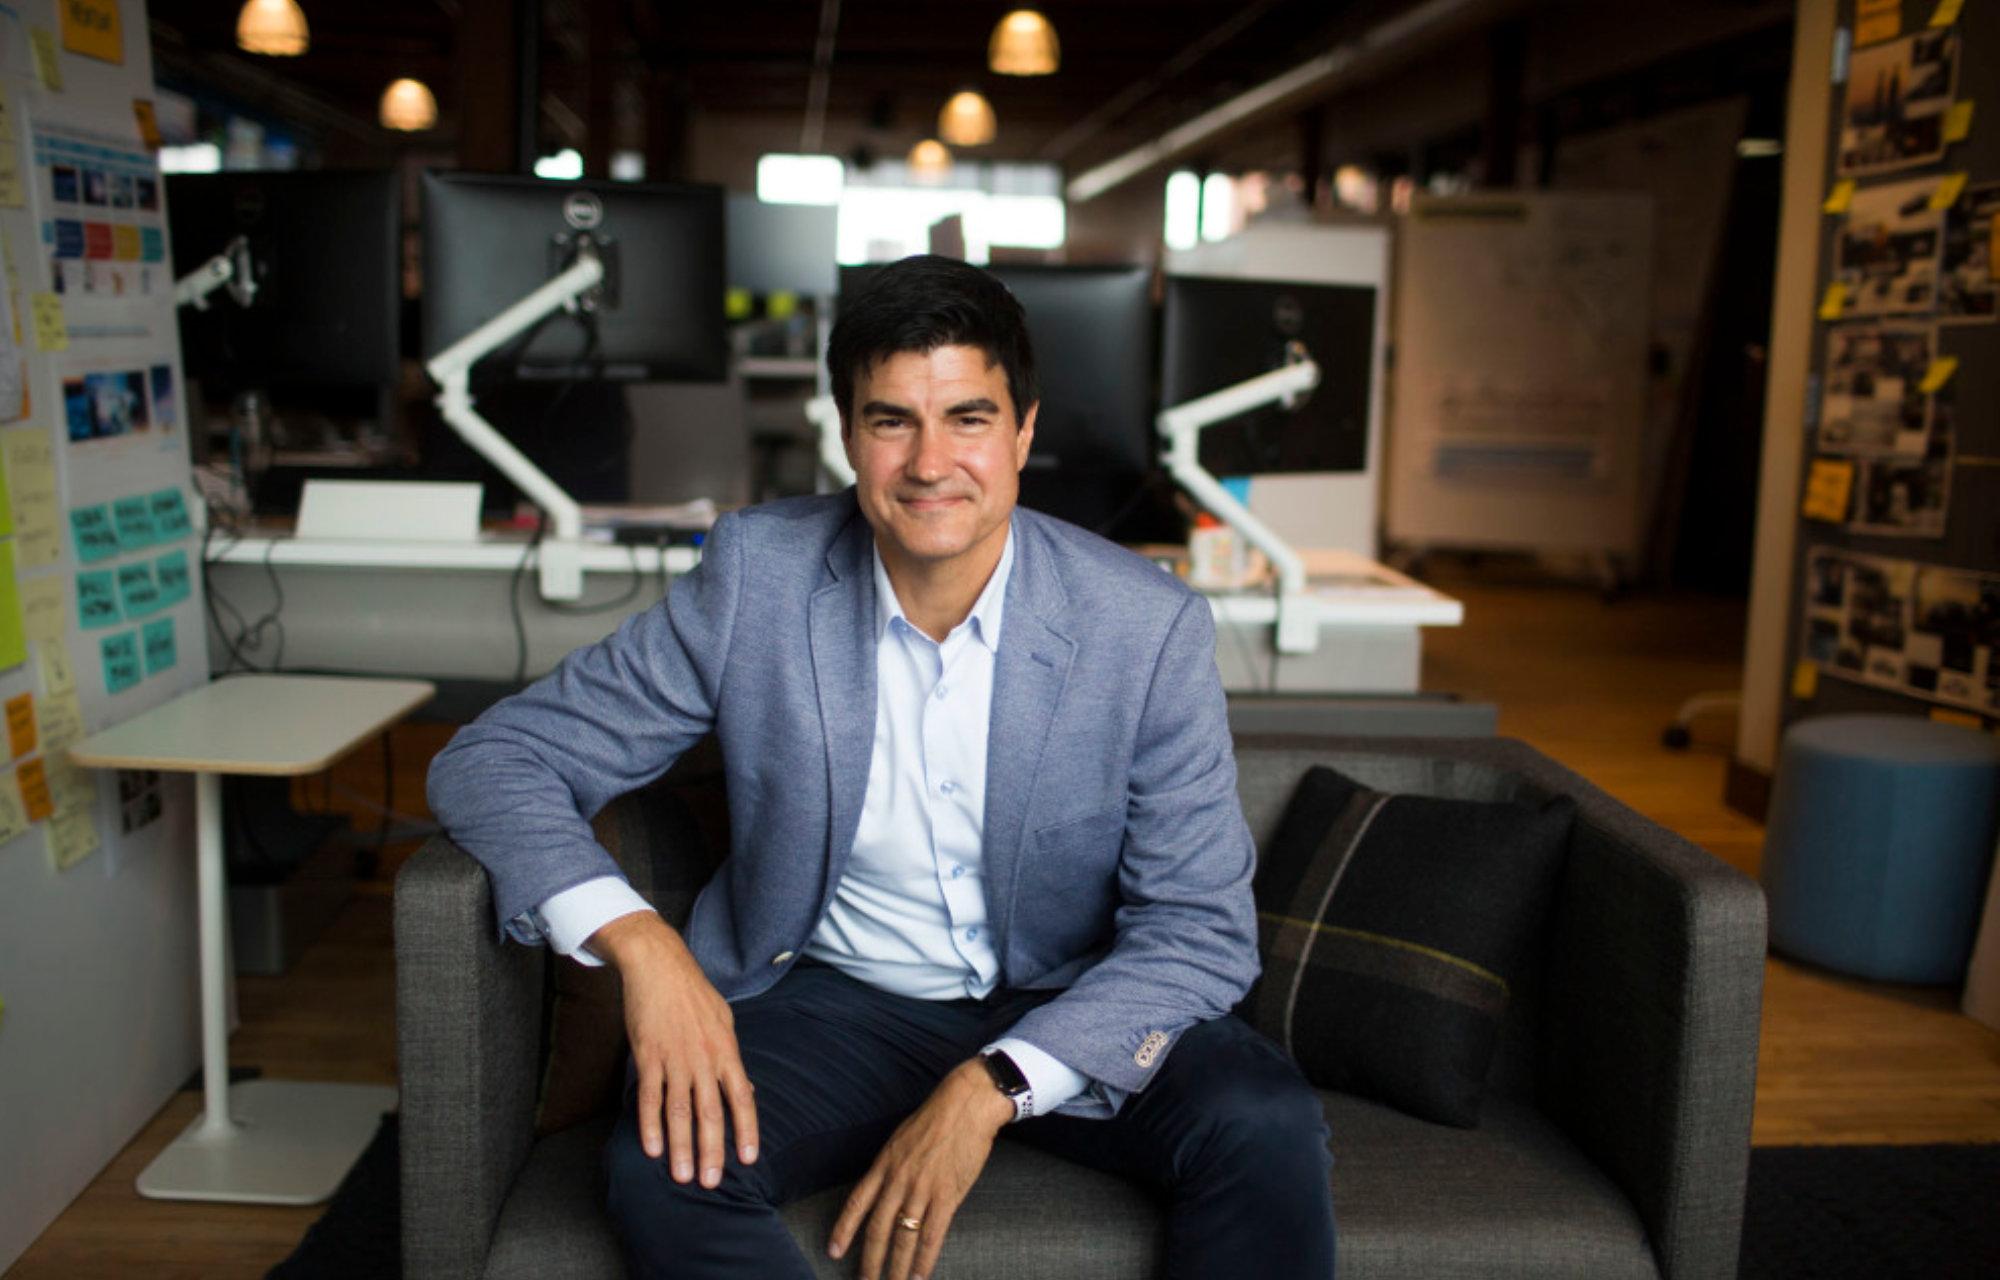 Ted Cannis, a Ford Pro vezérigazgatója